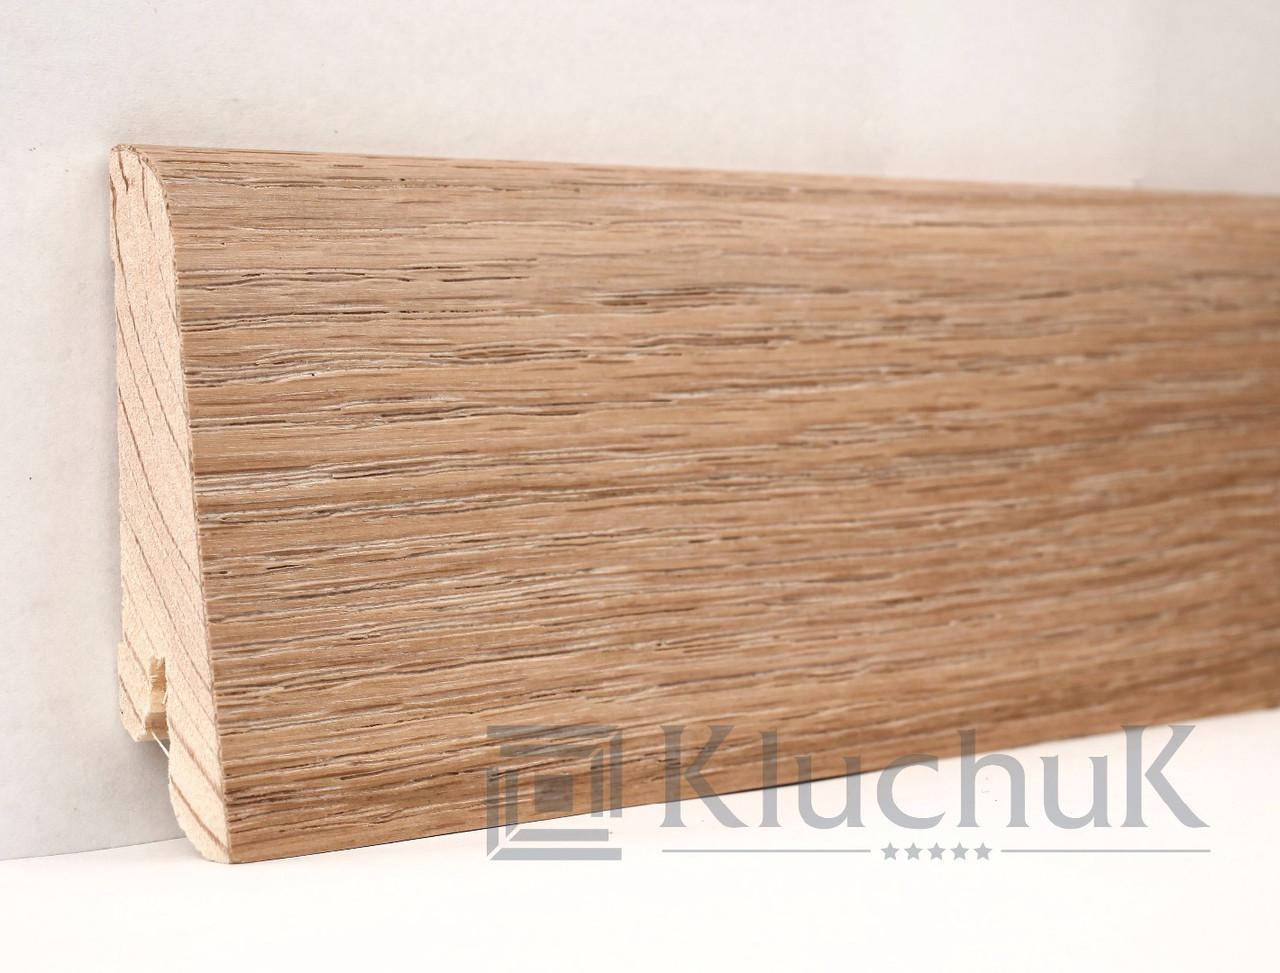 1467158480_plintus-kluchuk-evro